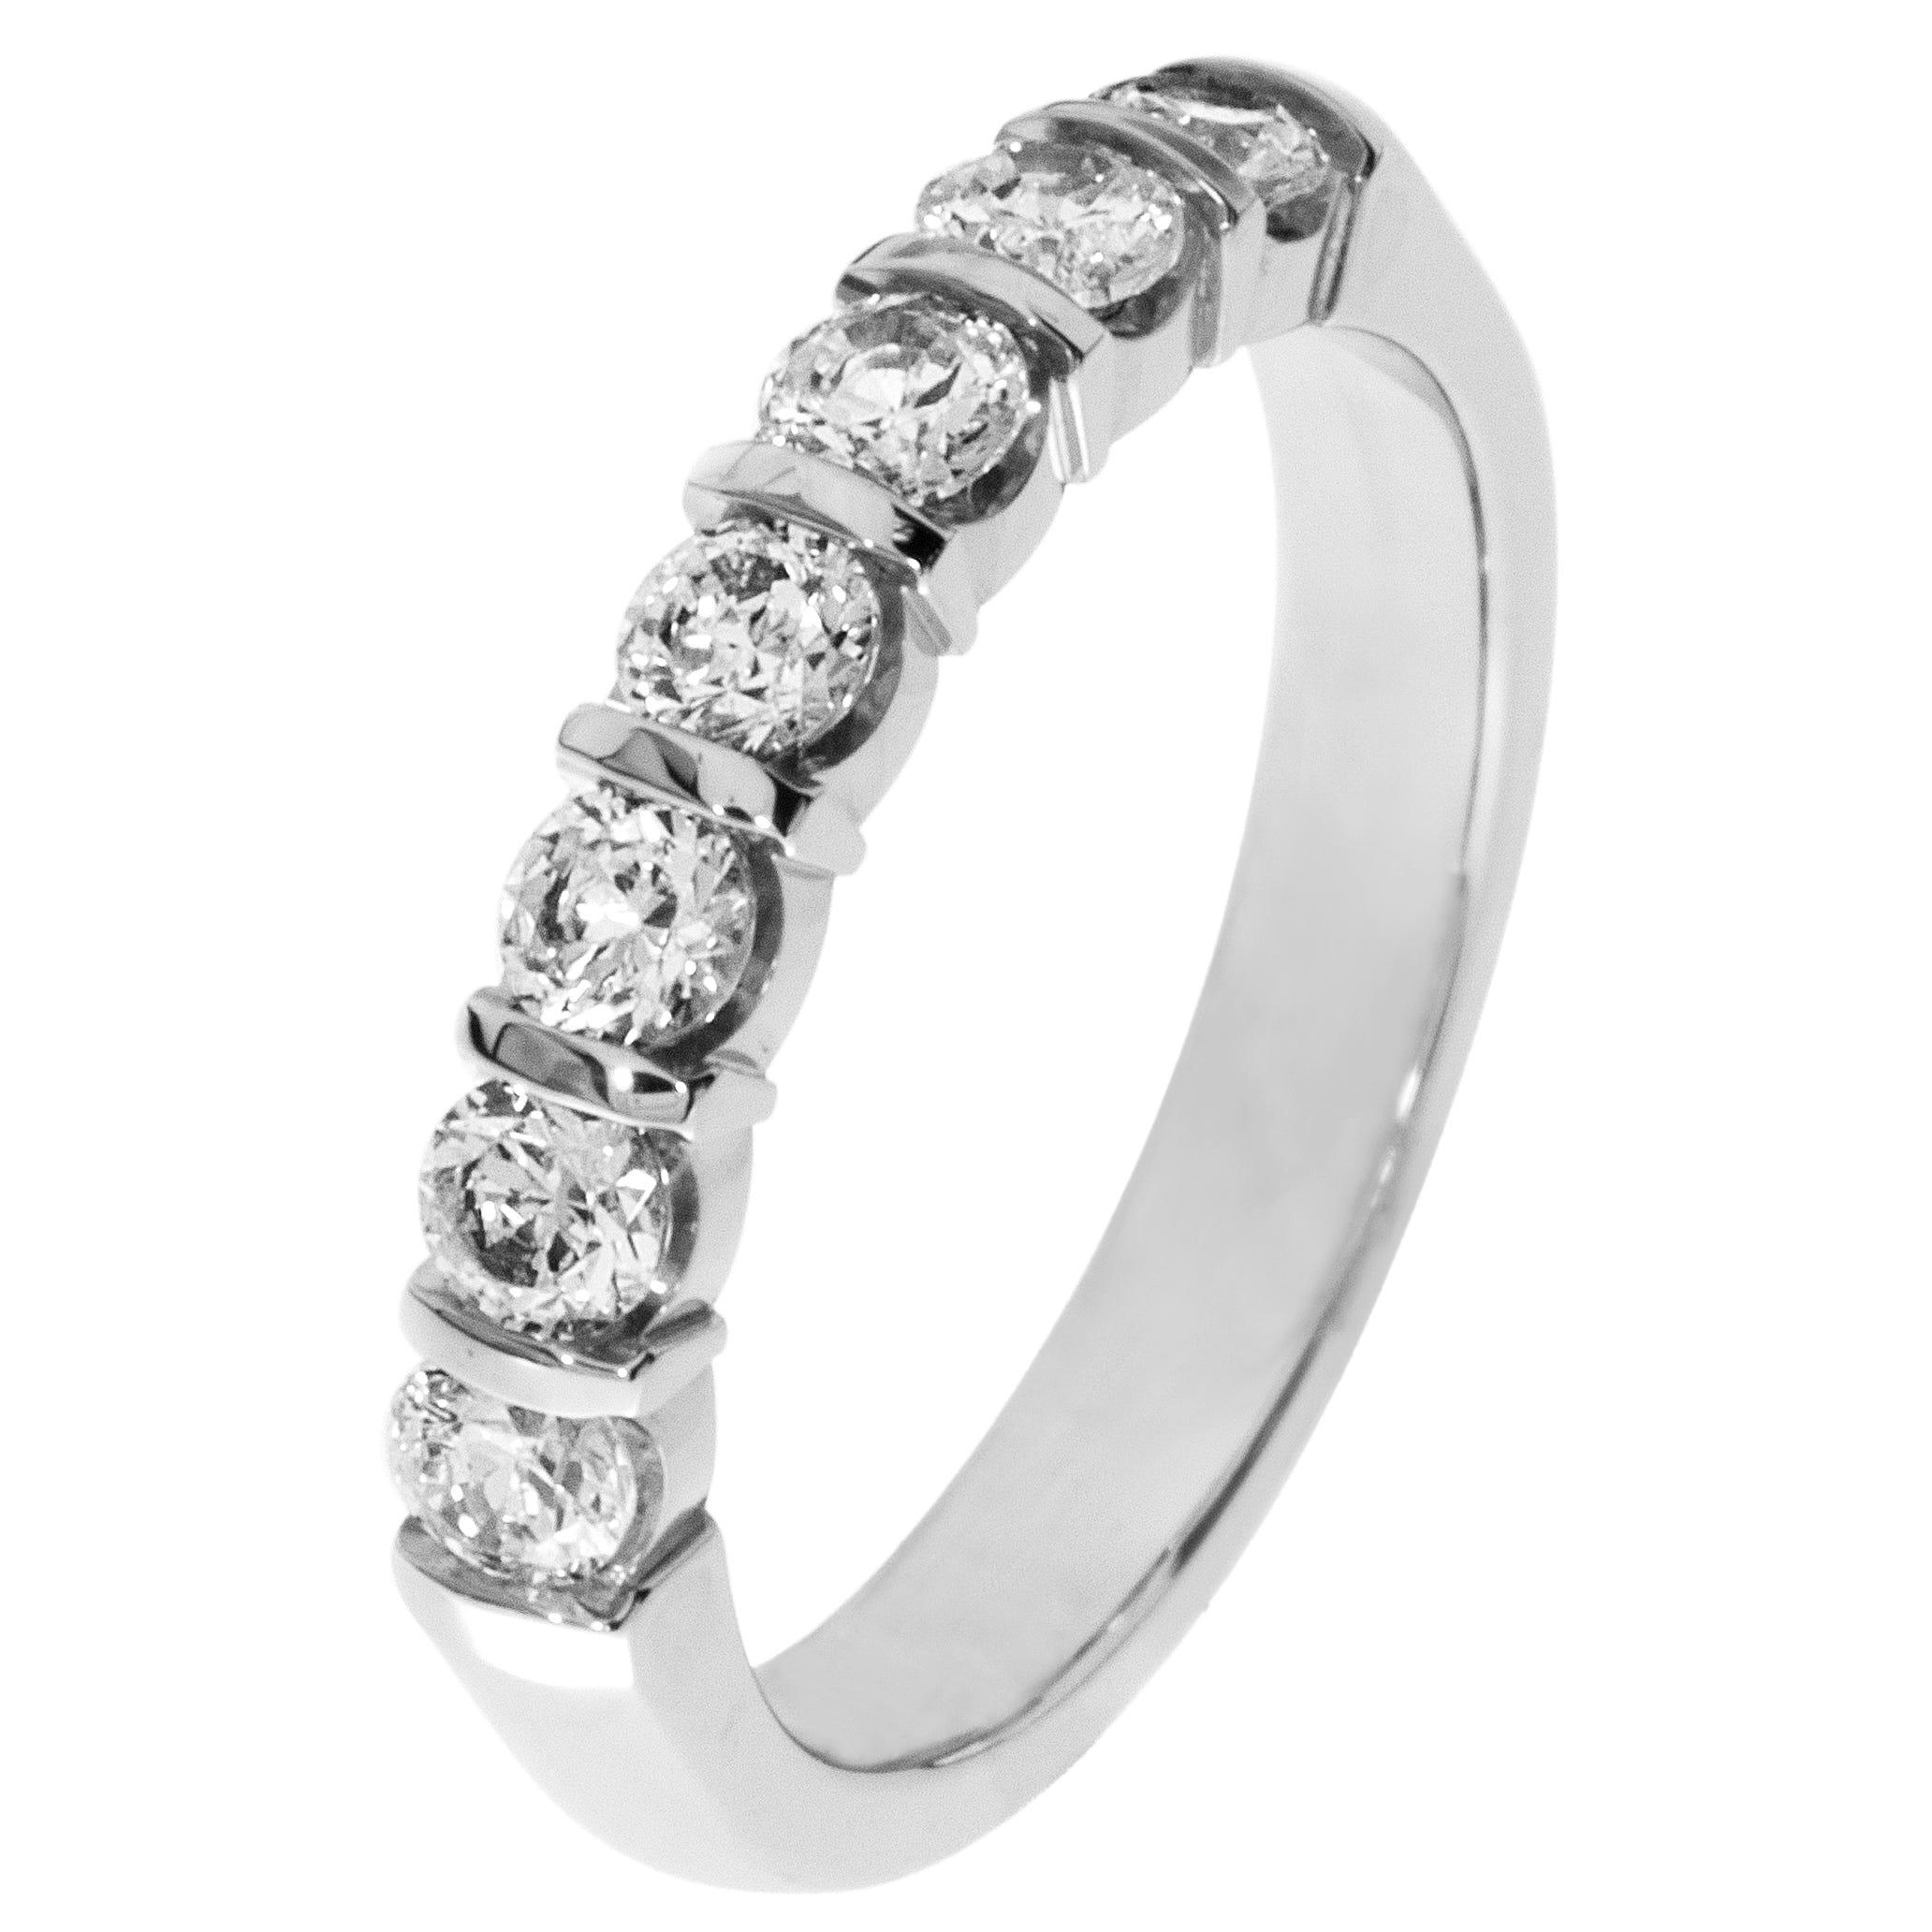 7-Stone Diamond Band 3/4ctw. (G-H, SI) Platinum